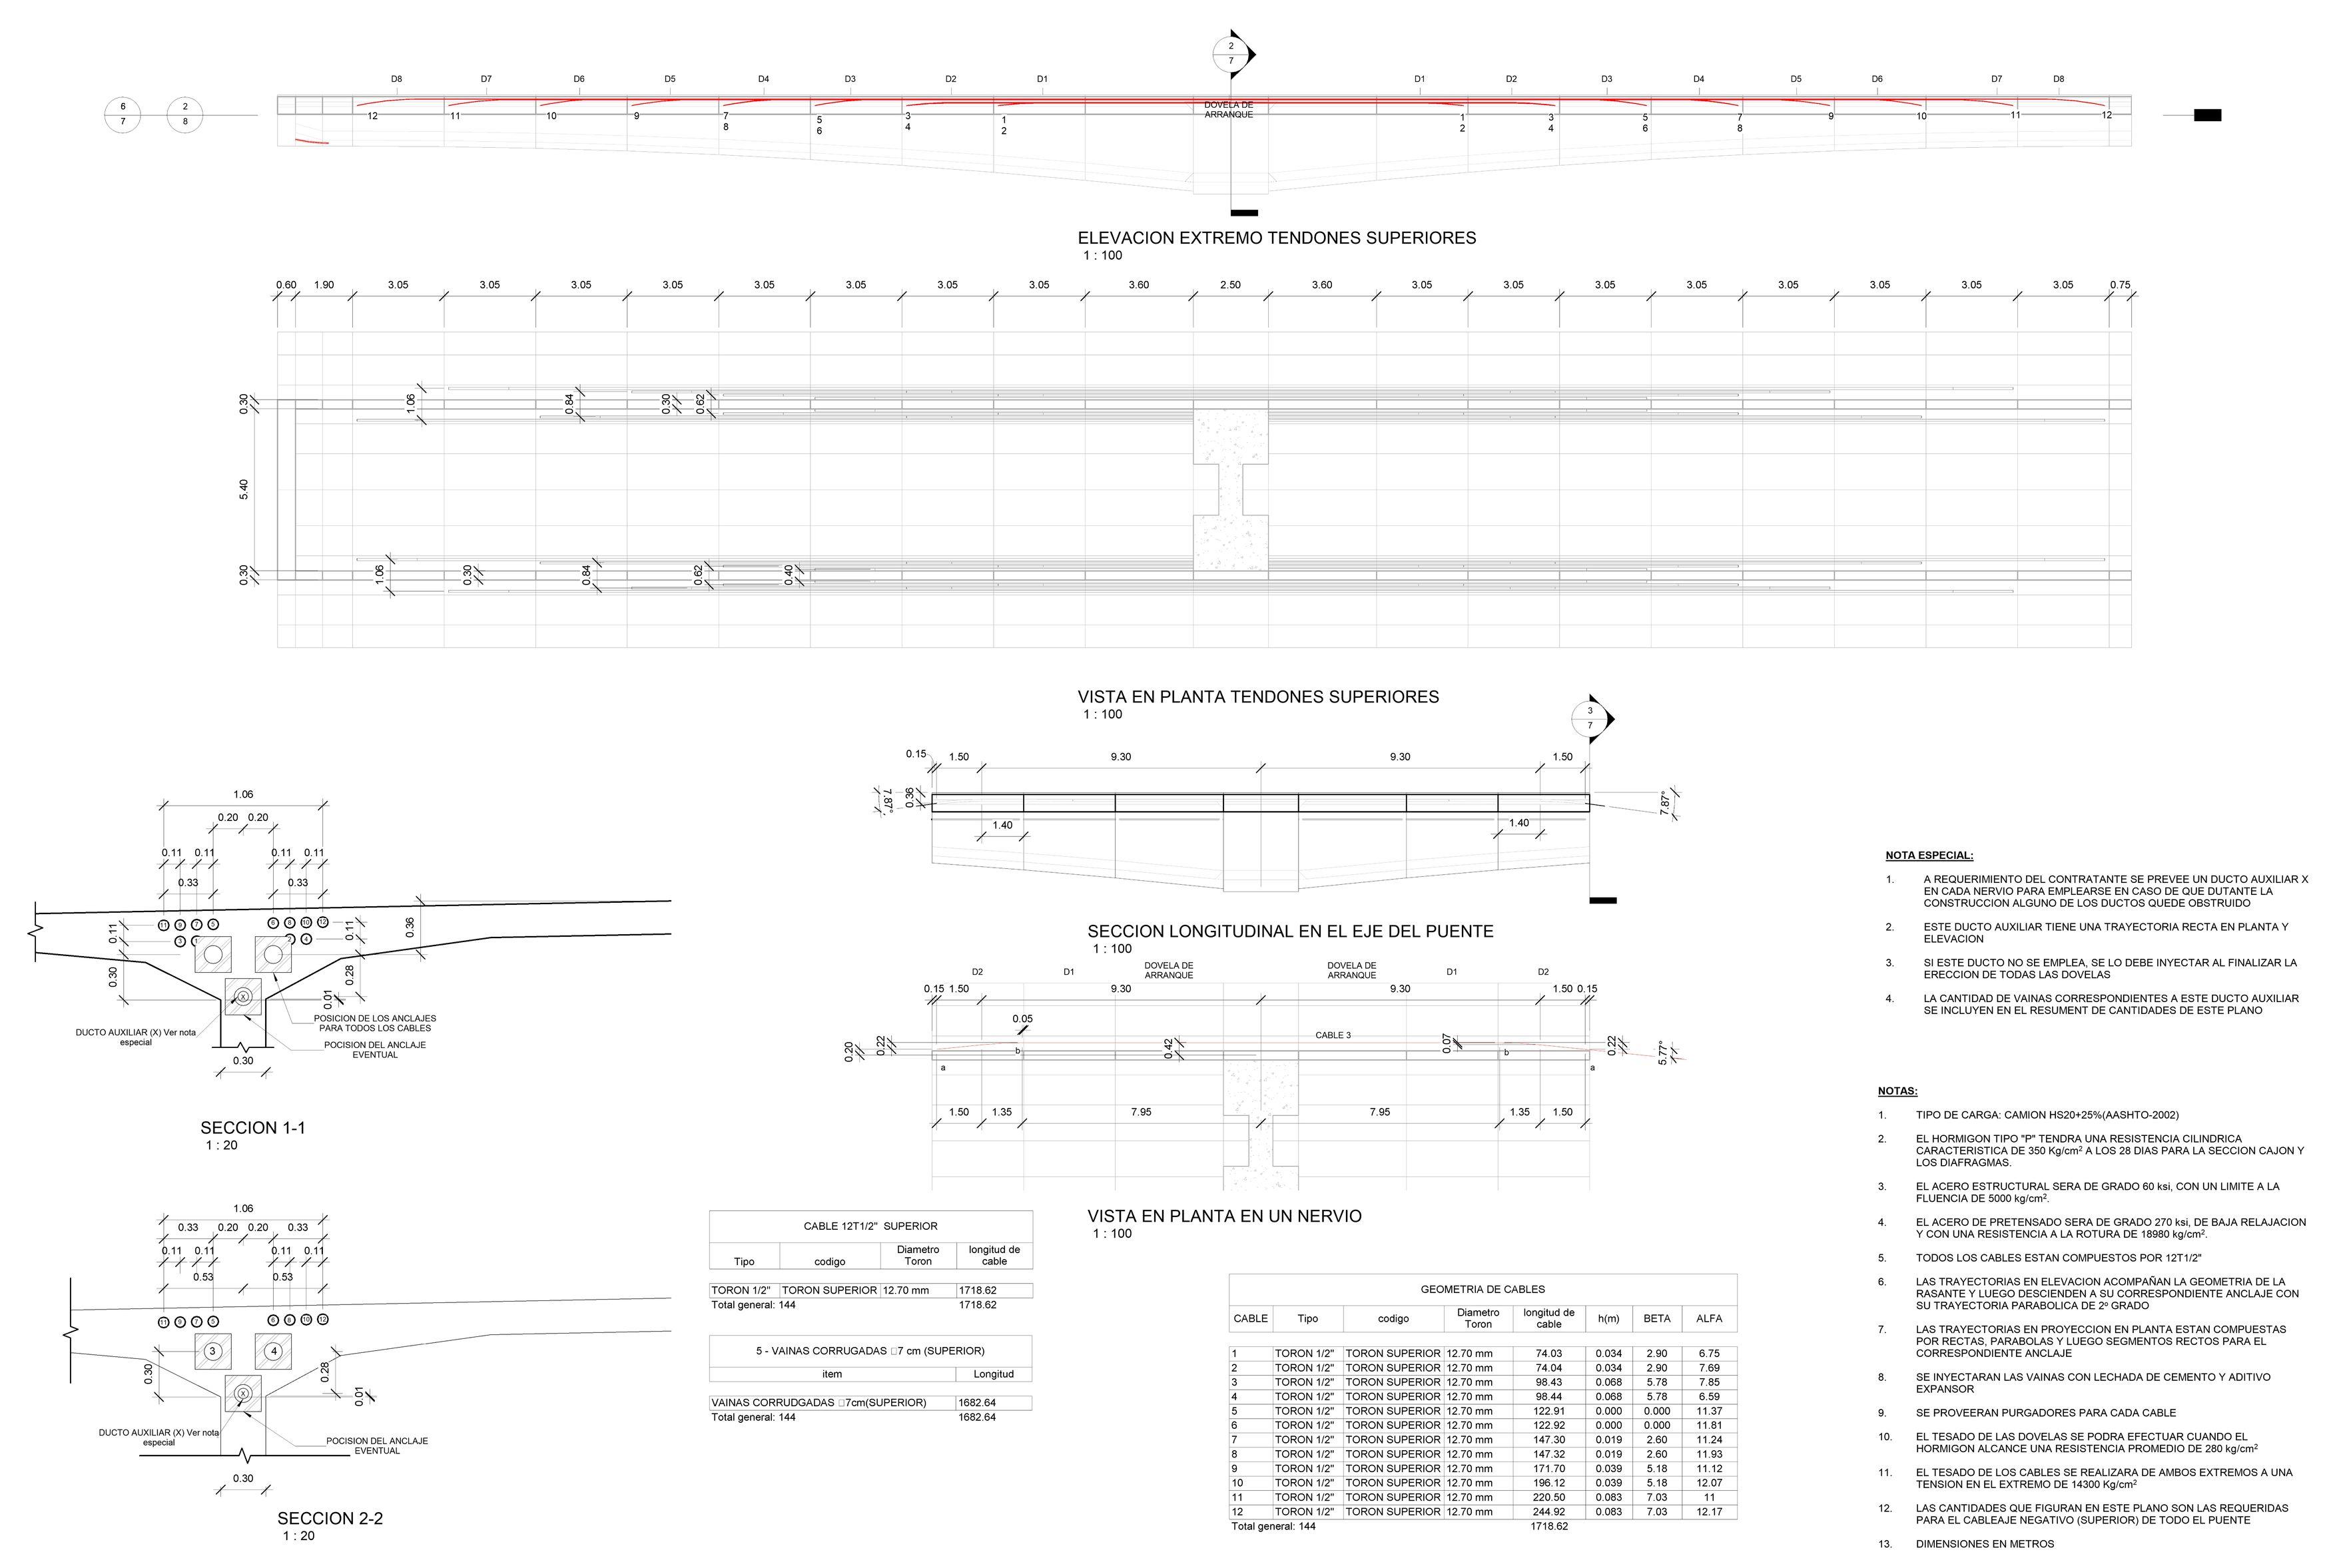 133---modelo-puente-rev30---plano---7---plano-de-pretensado-1-3-3500-3500